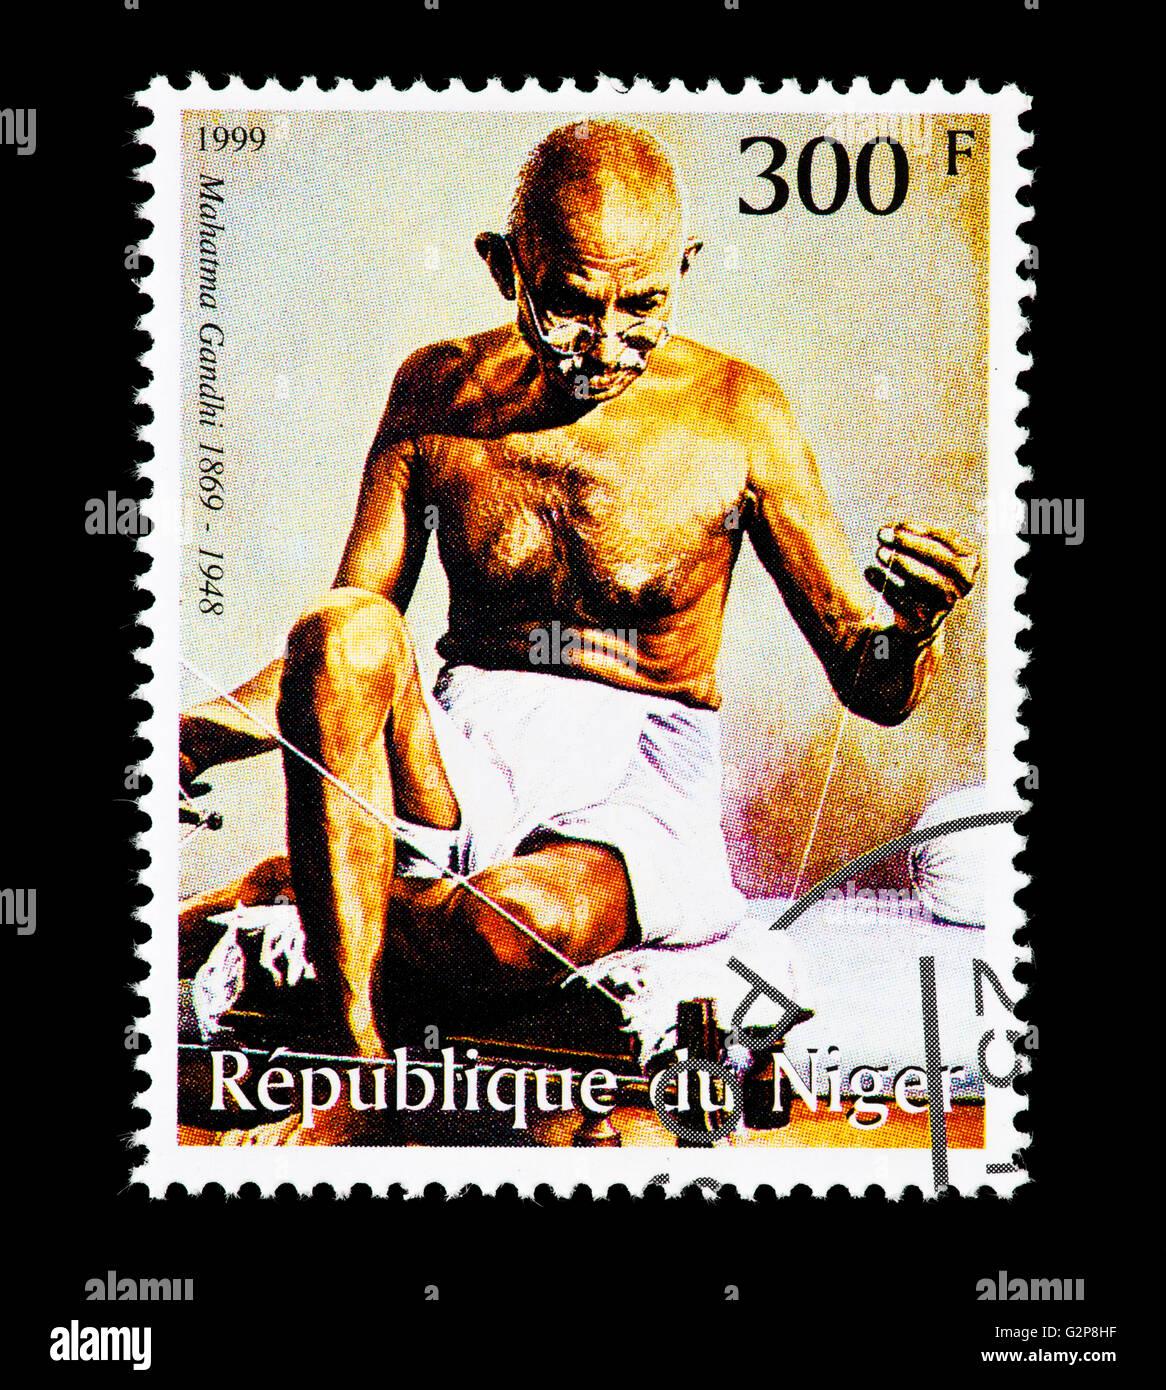 Postage stamp from Niger depicting Mohandas Karamchand Gandhi, Indian independence movement leader. - Stock Image